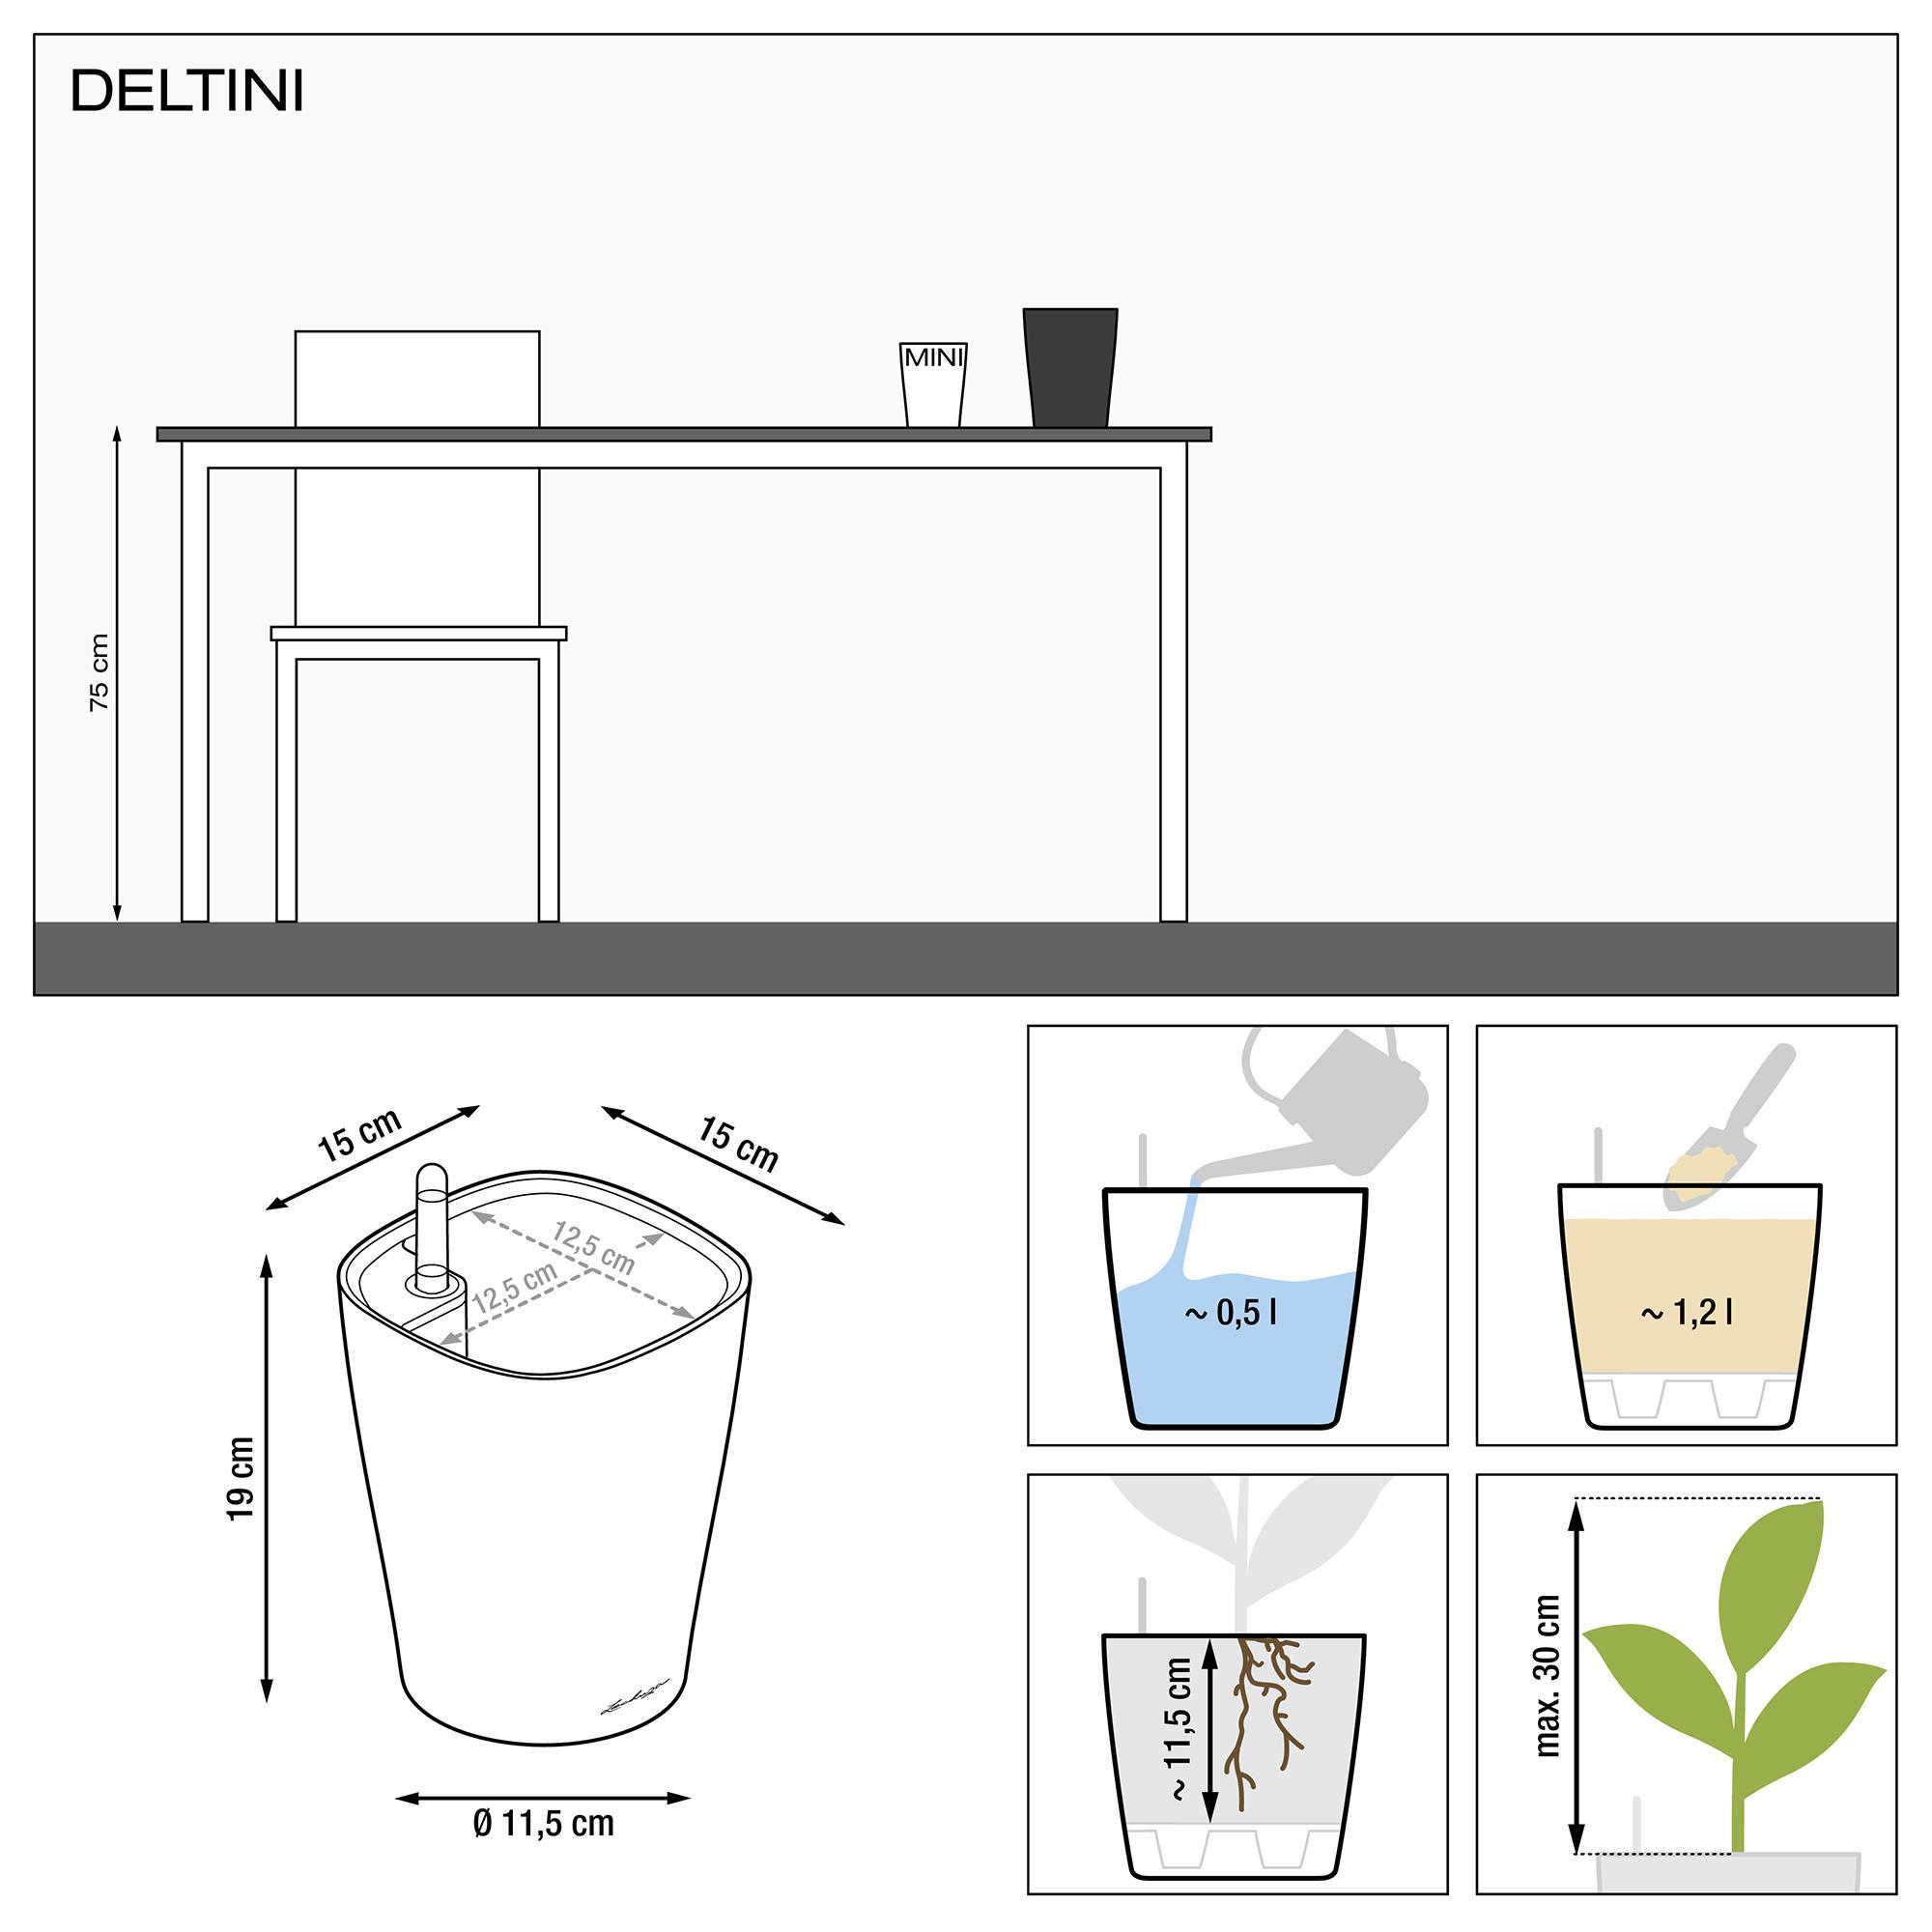 DELTINI espresso metallic - Image 3